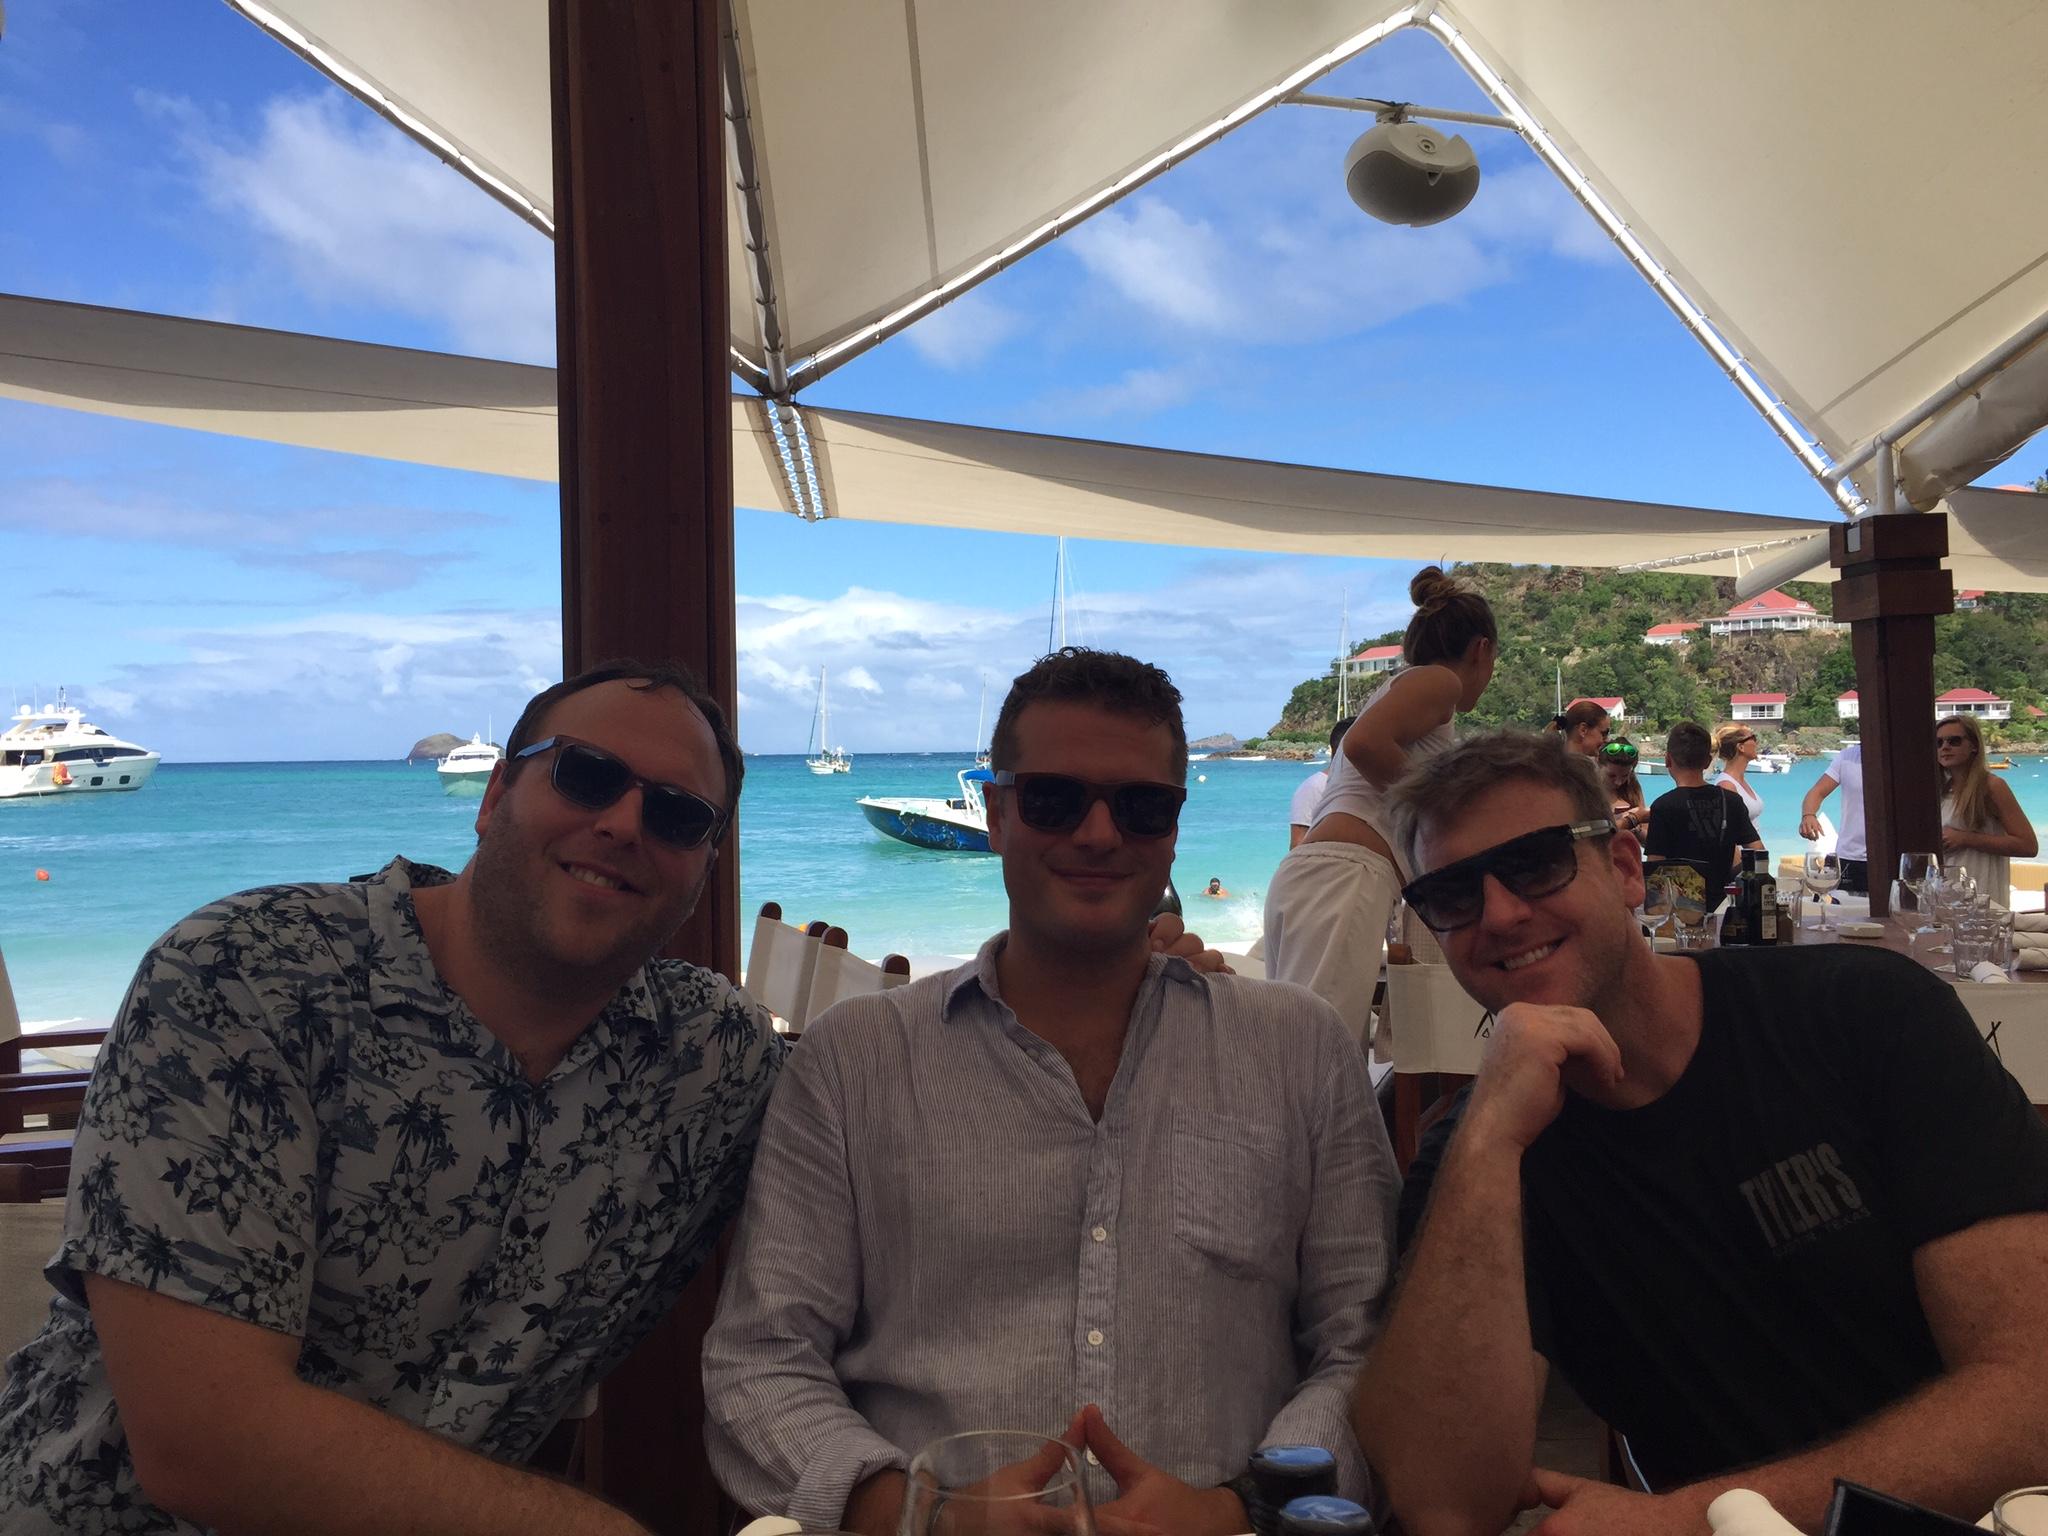 Da Boyz... Ben, Jay, and Zach... paradise at their backs.